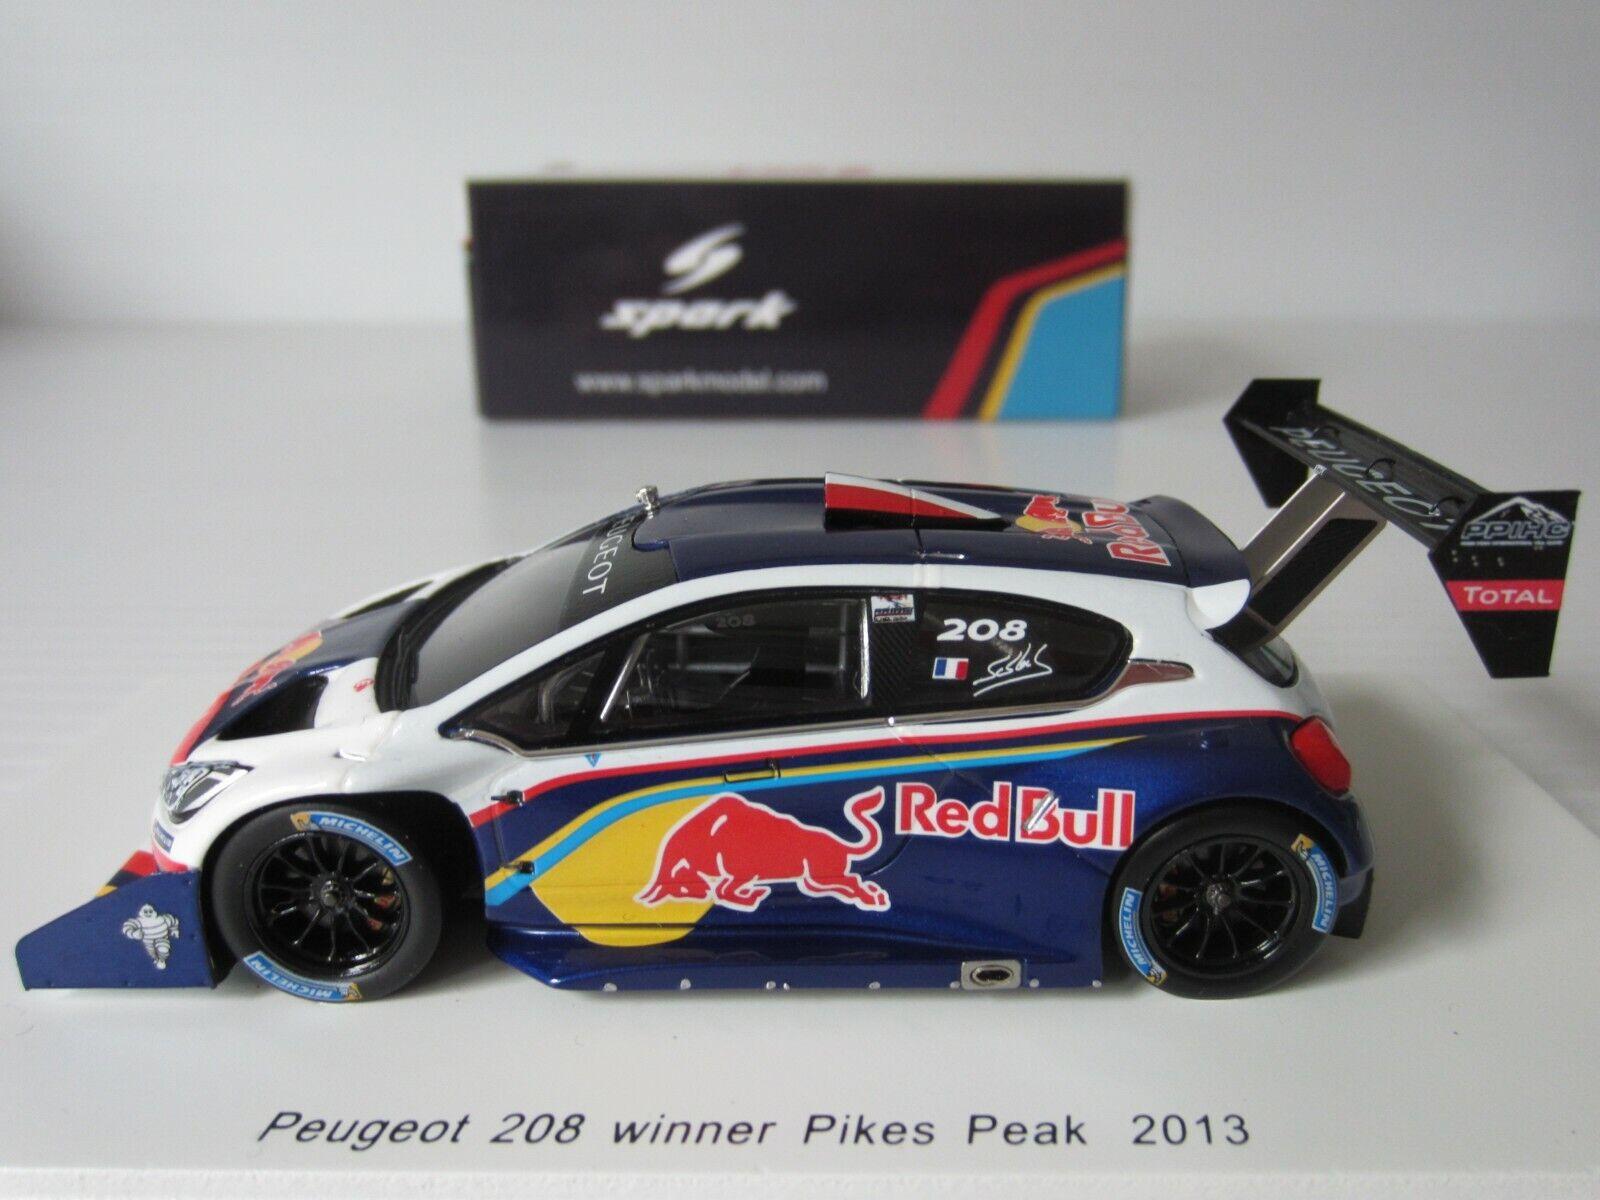 Spark, Peugeot 208 Pikes Peak ganador 2013, 1 43 Escala Modelo de Resina, S Loeb  S3783